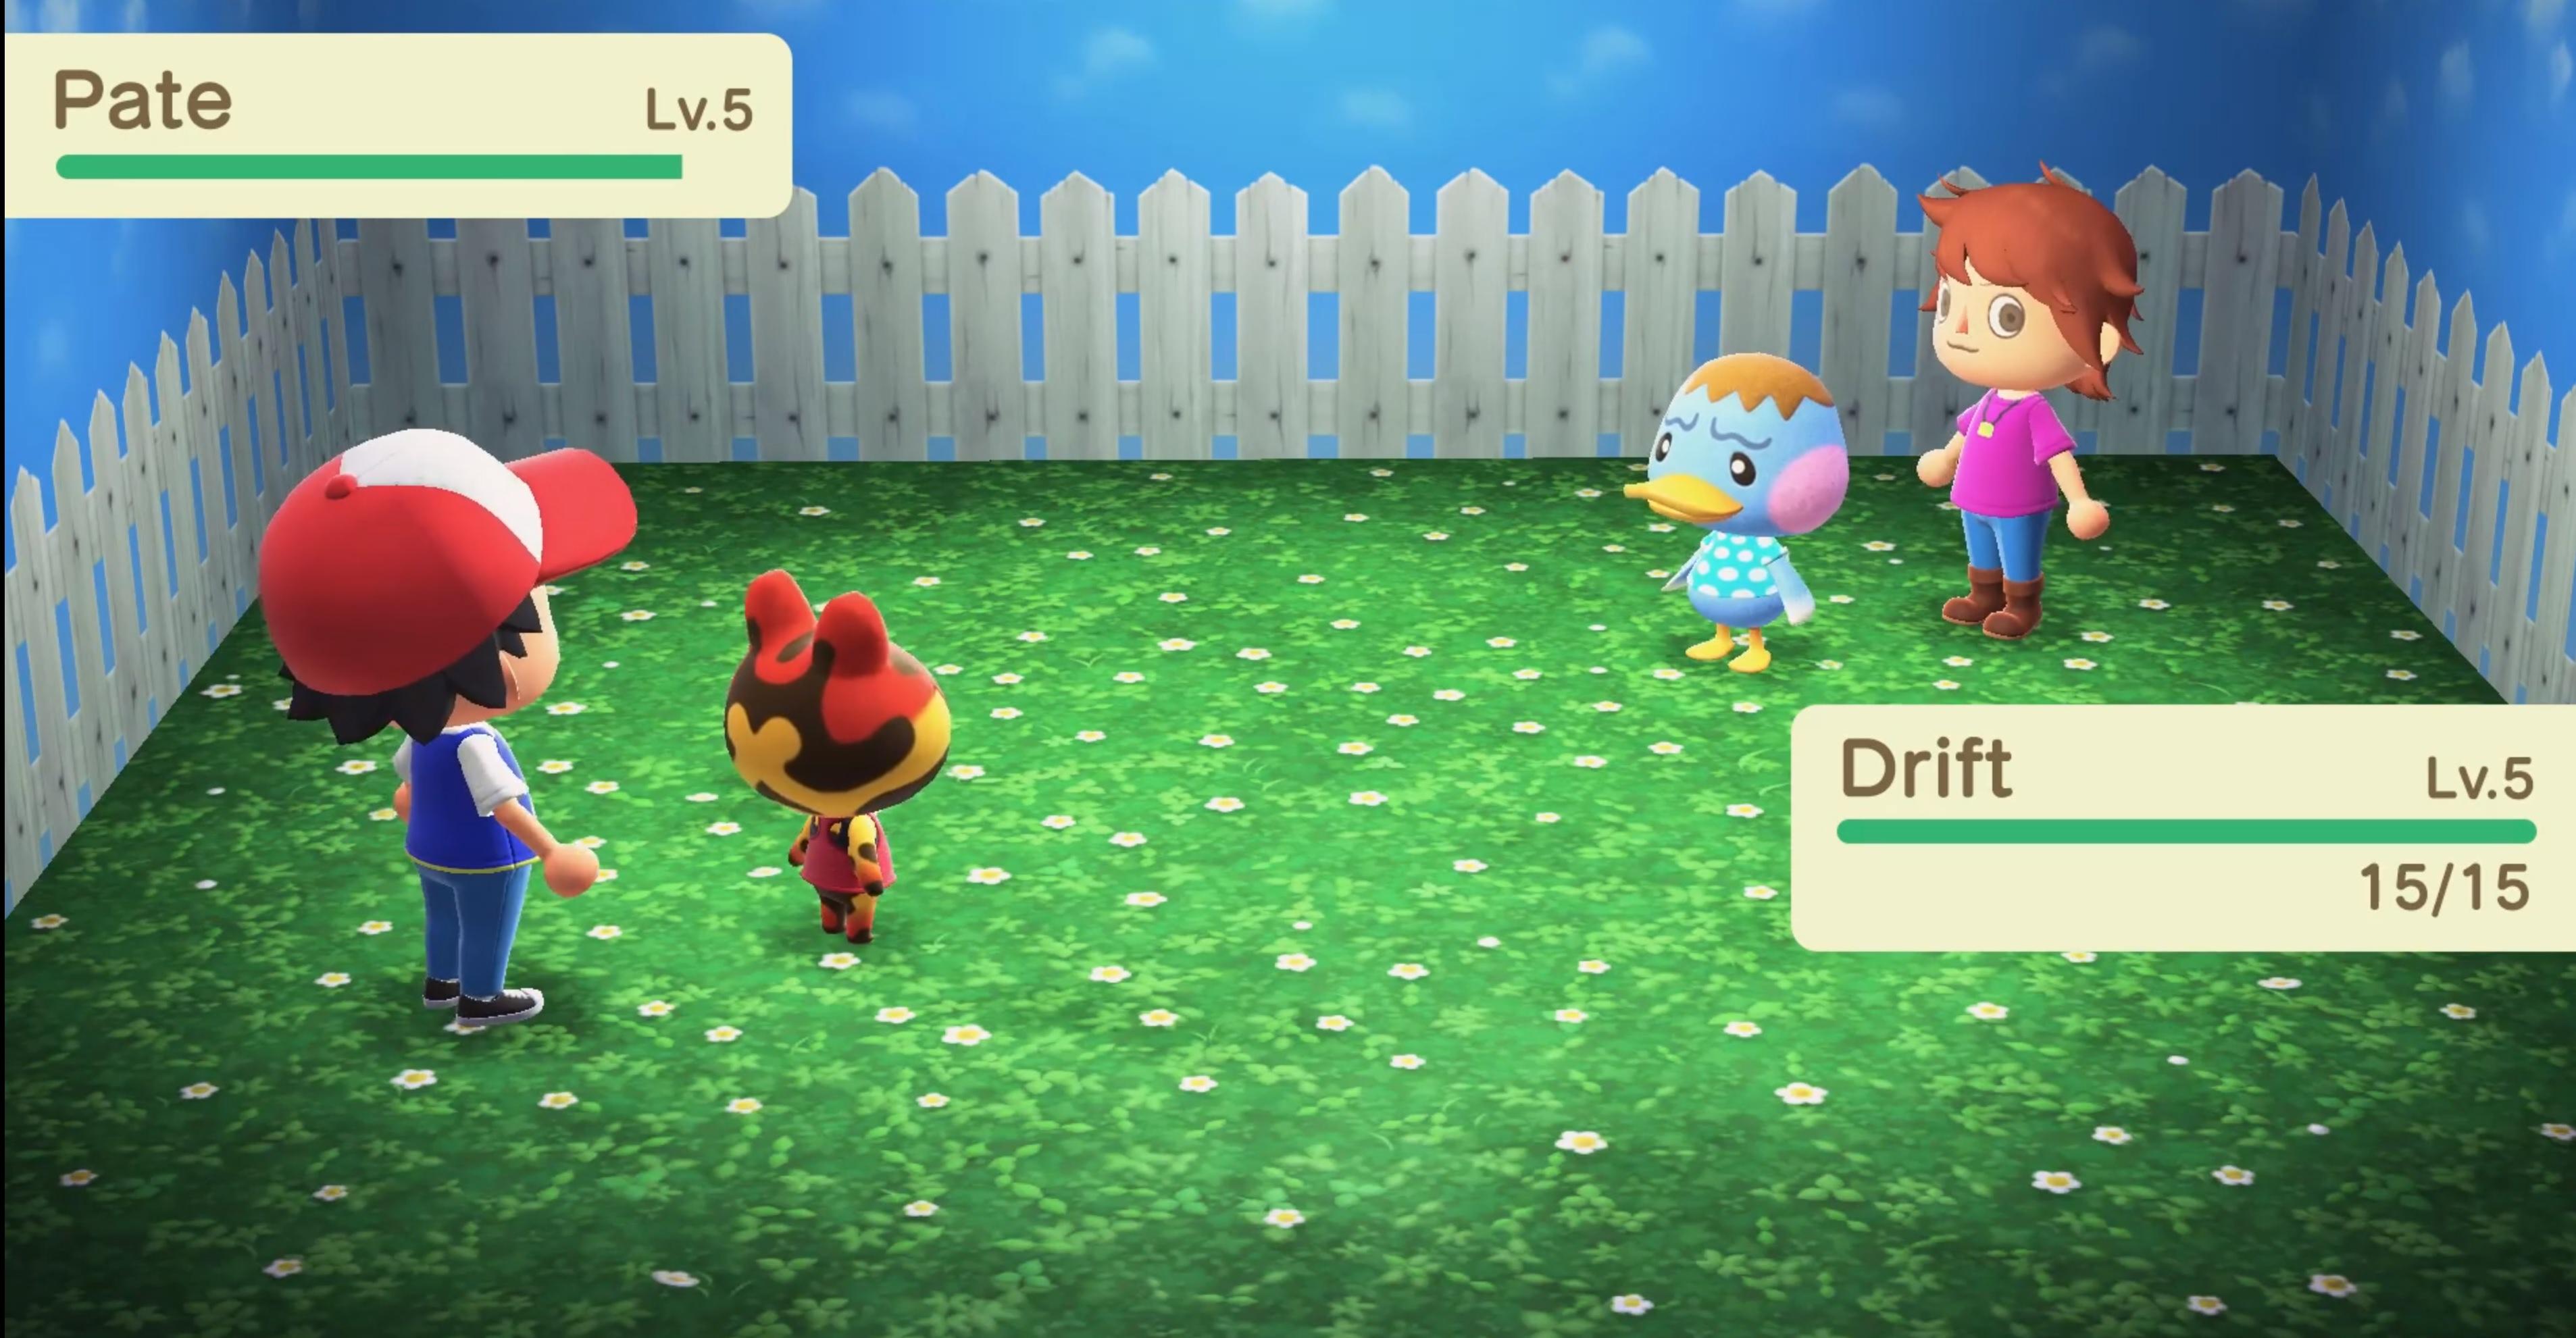 Someone recreated a Pokemon battle in Animal Crossing: New Horizons screenshot